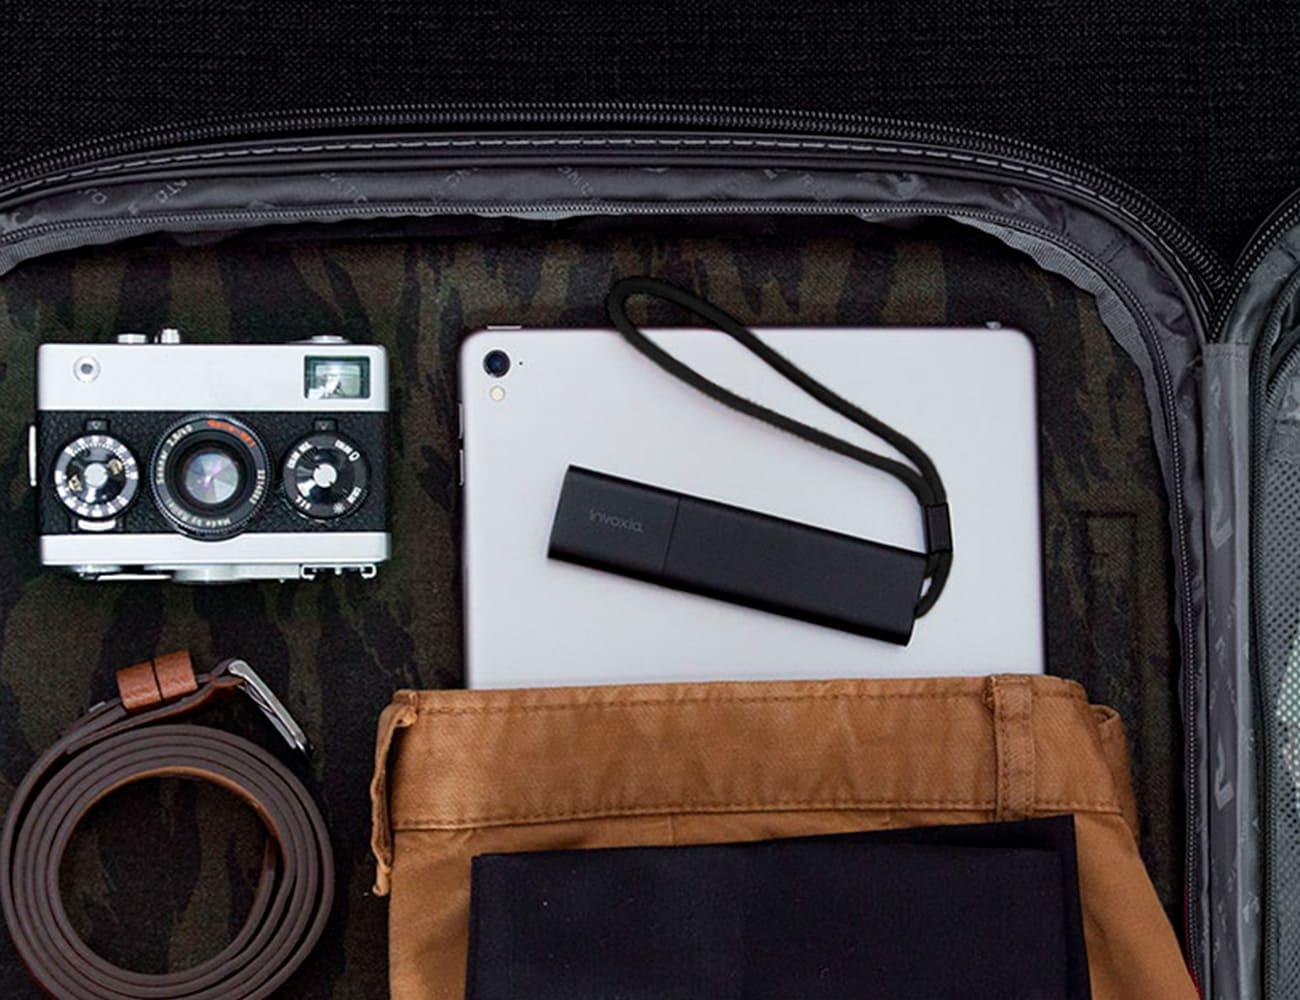 Invoxia GPS tracker in bag